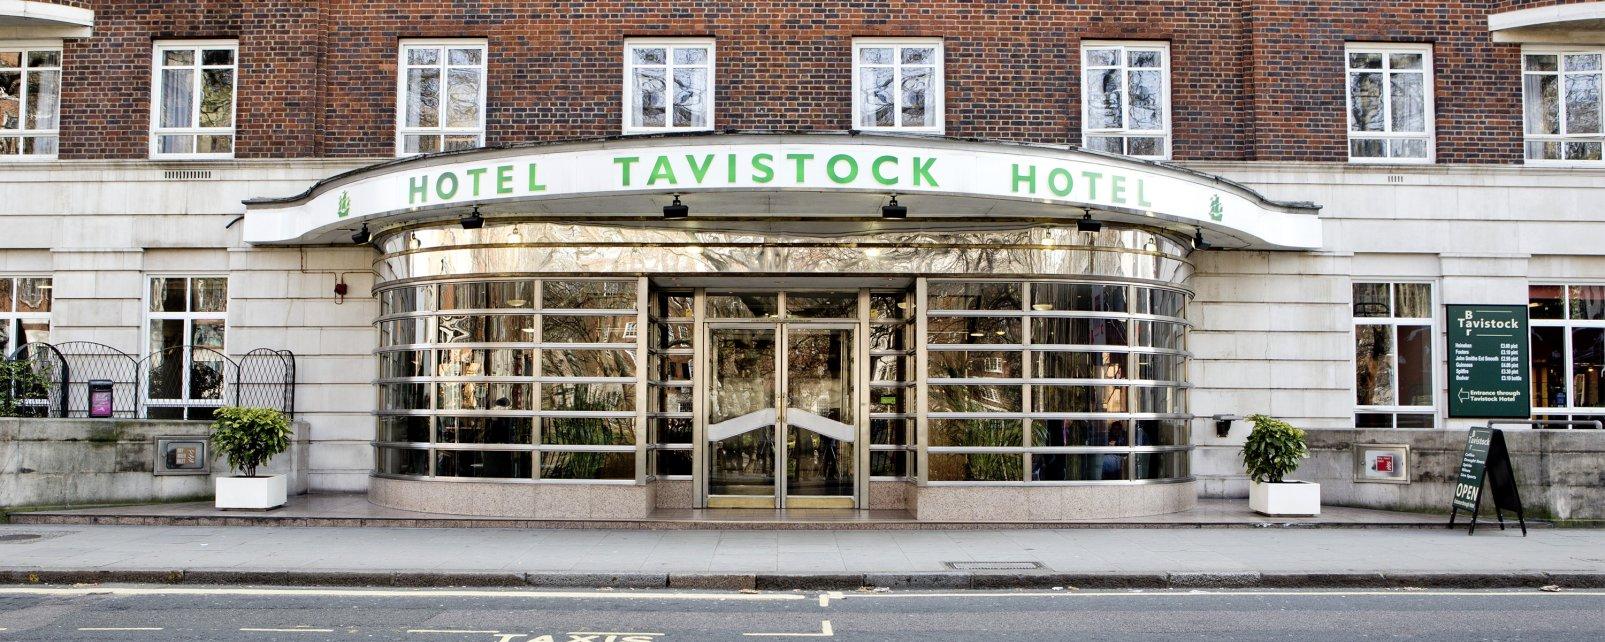 Hotel Tavistock Hotel